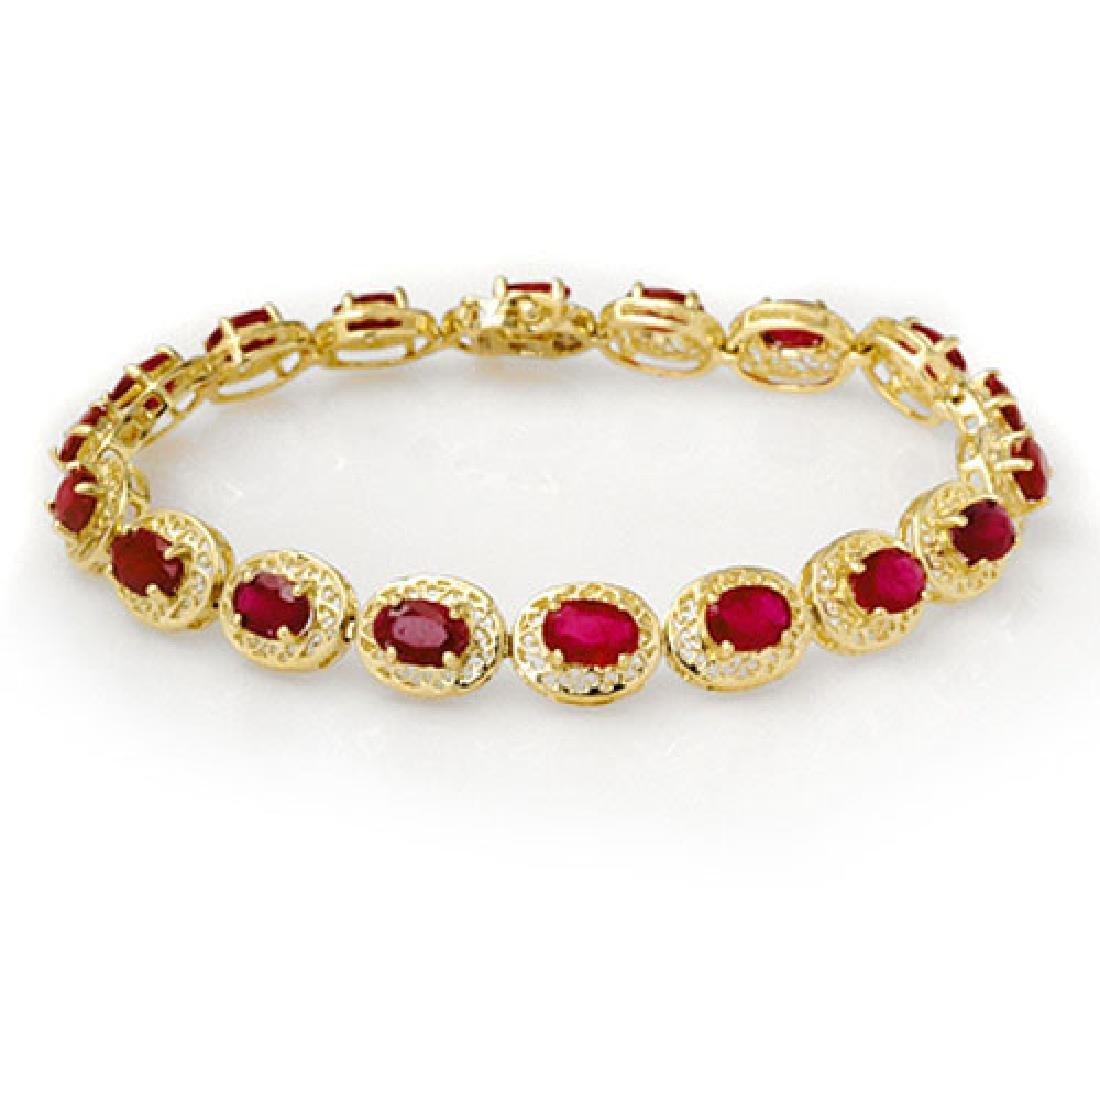 12.75 CTW Ruby Bracelet 10K Yellow Gold